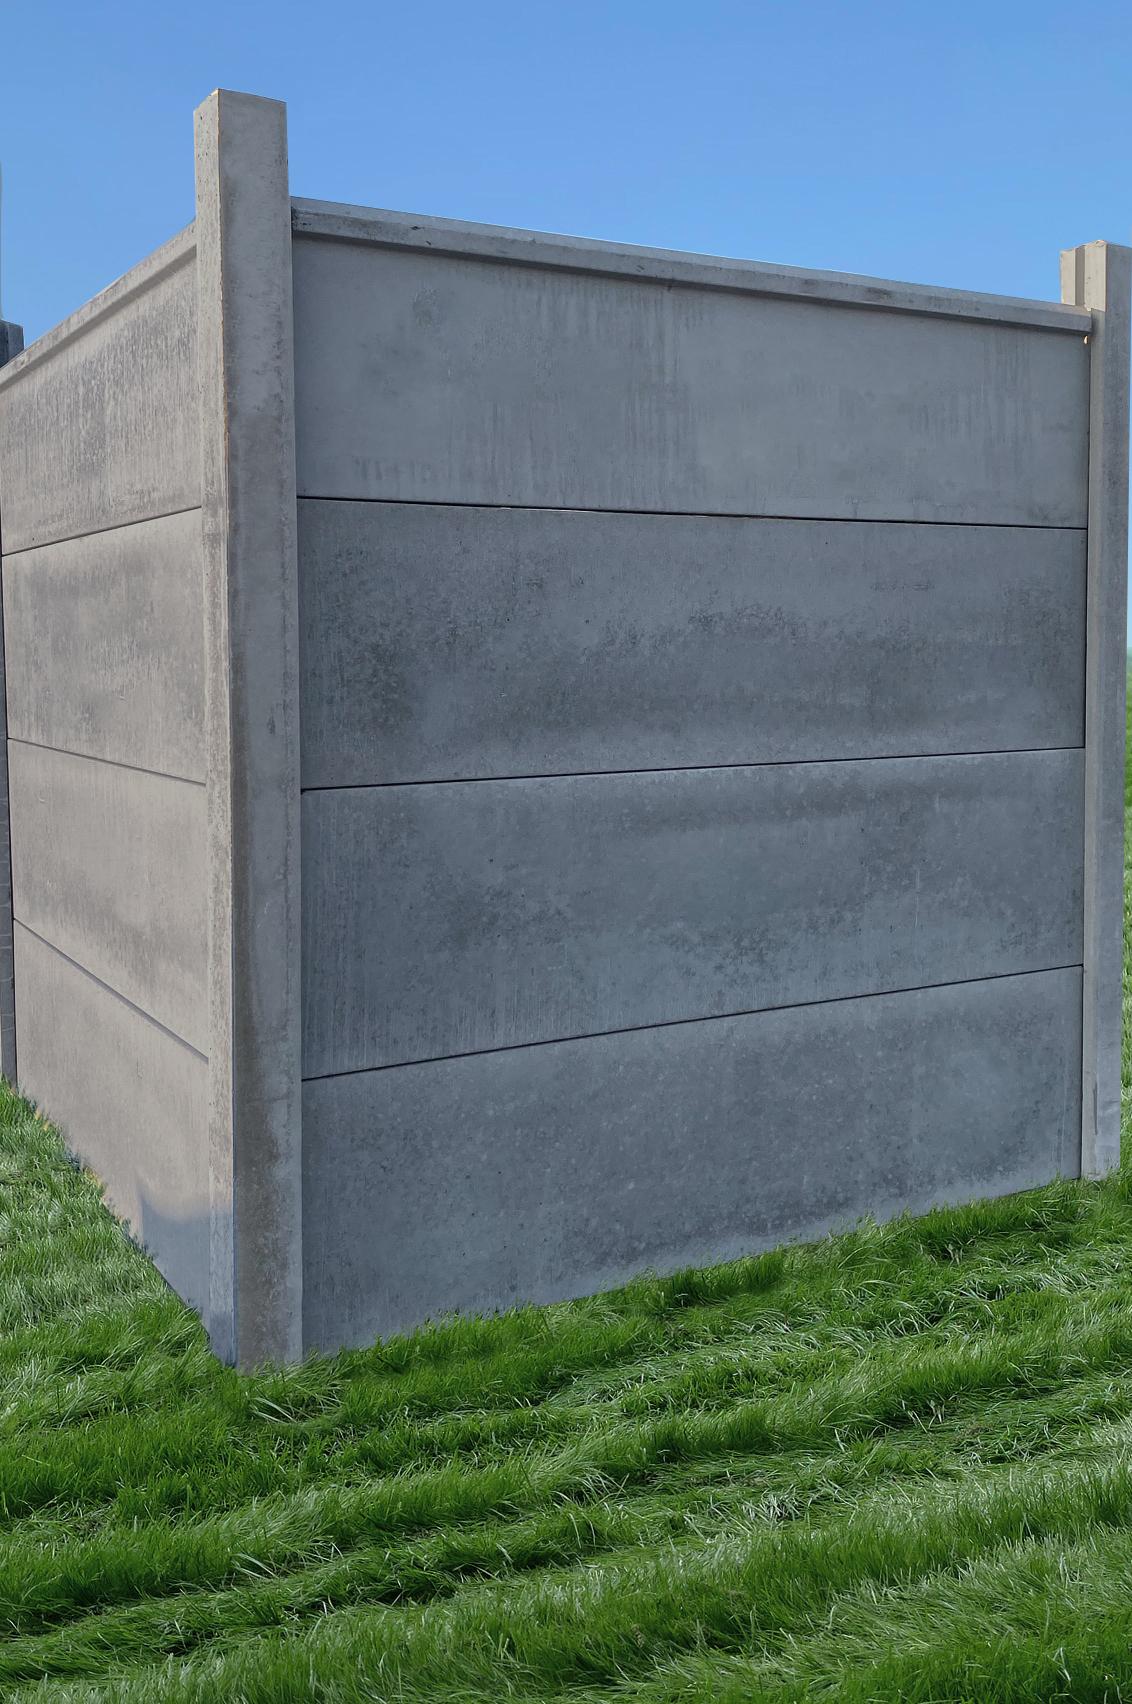 1920x500x35 mm